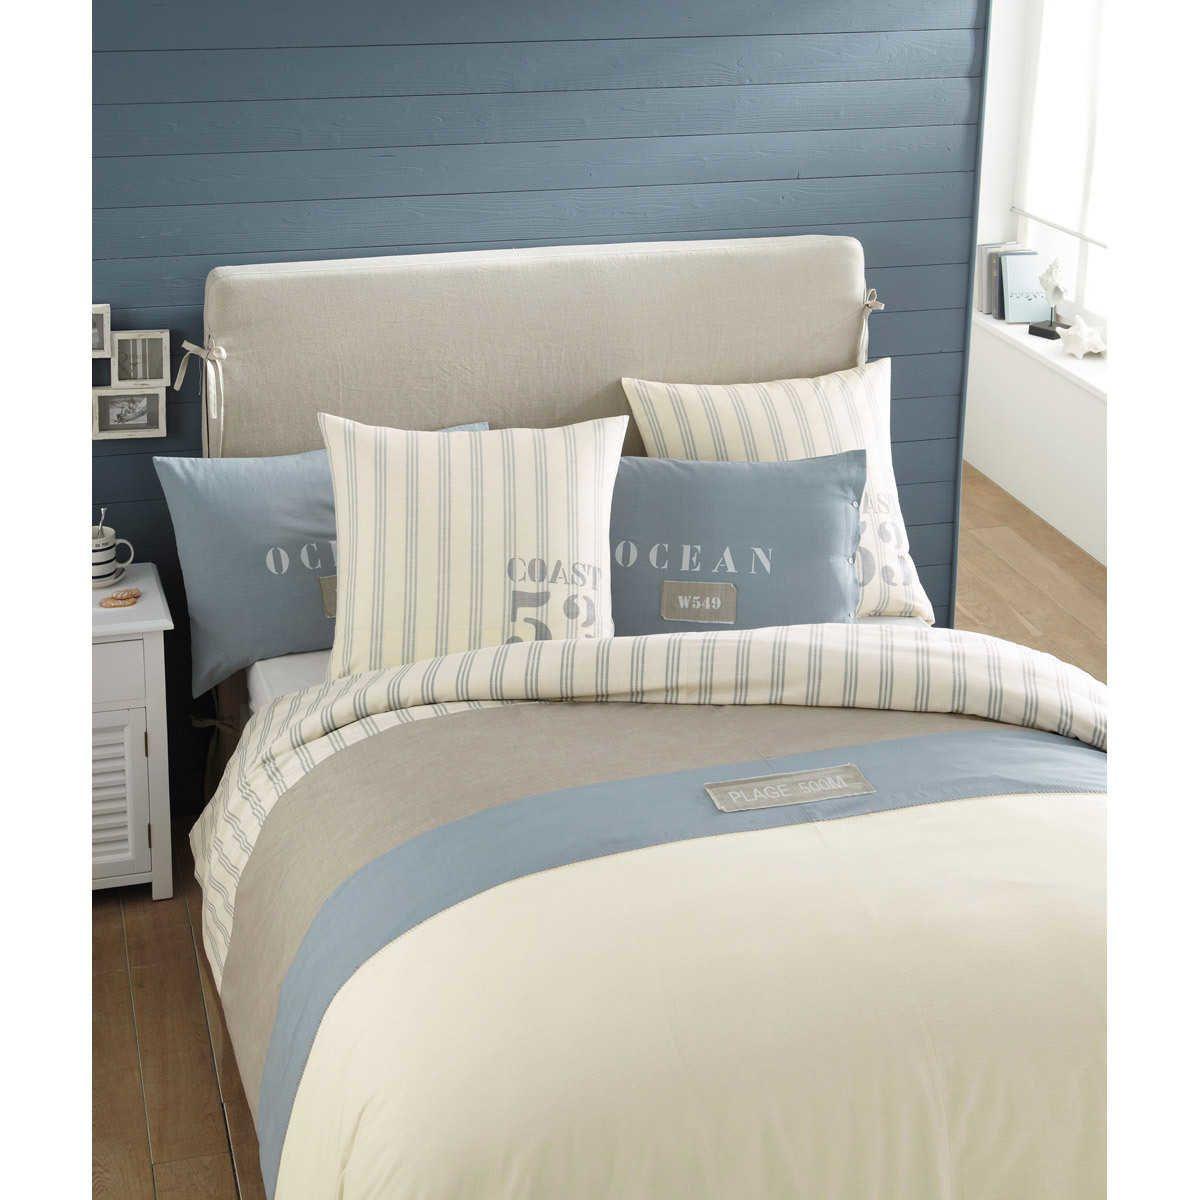 cotton bedding set in white 220 x 240cm maisons du monde. Black Bedroom Furniture Sets. Home Design Ideas